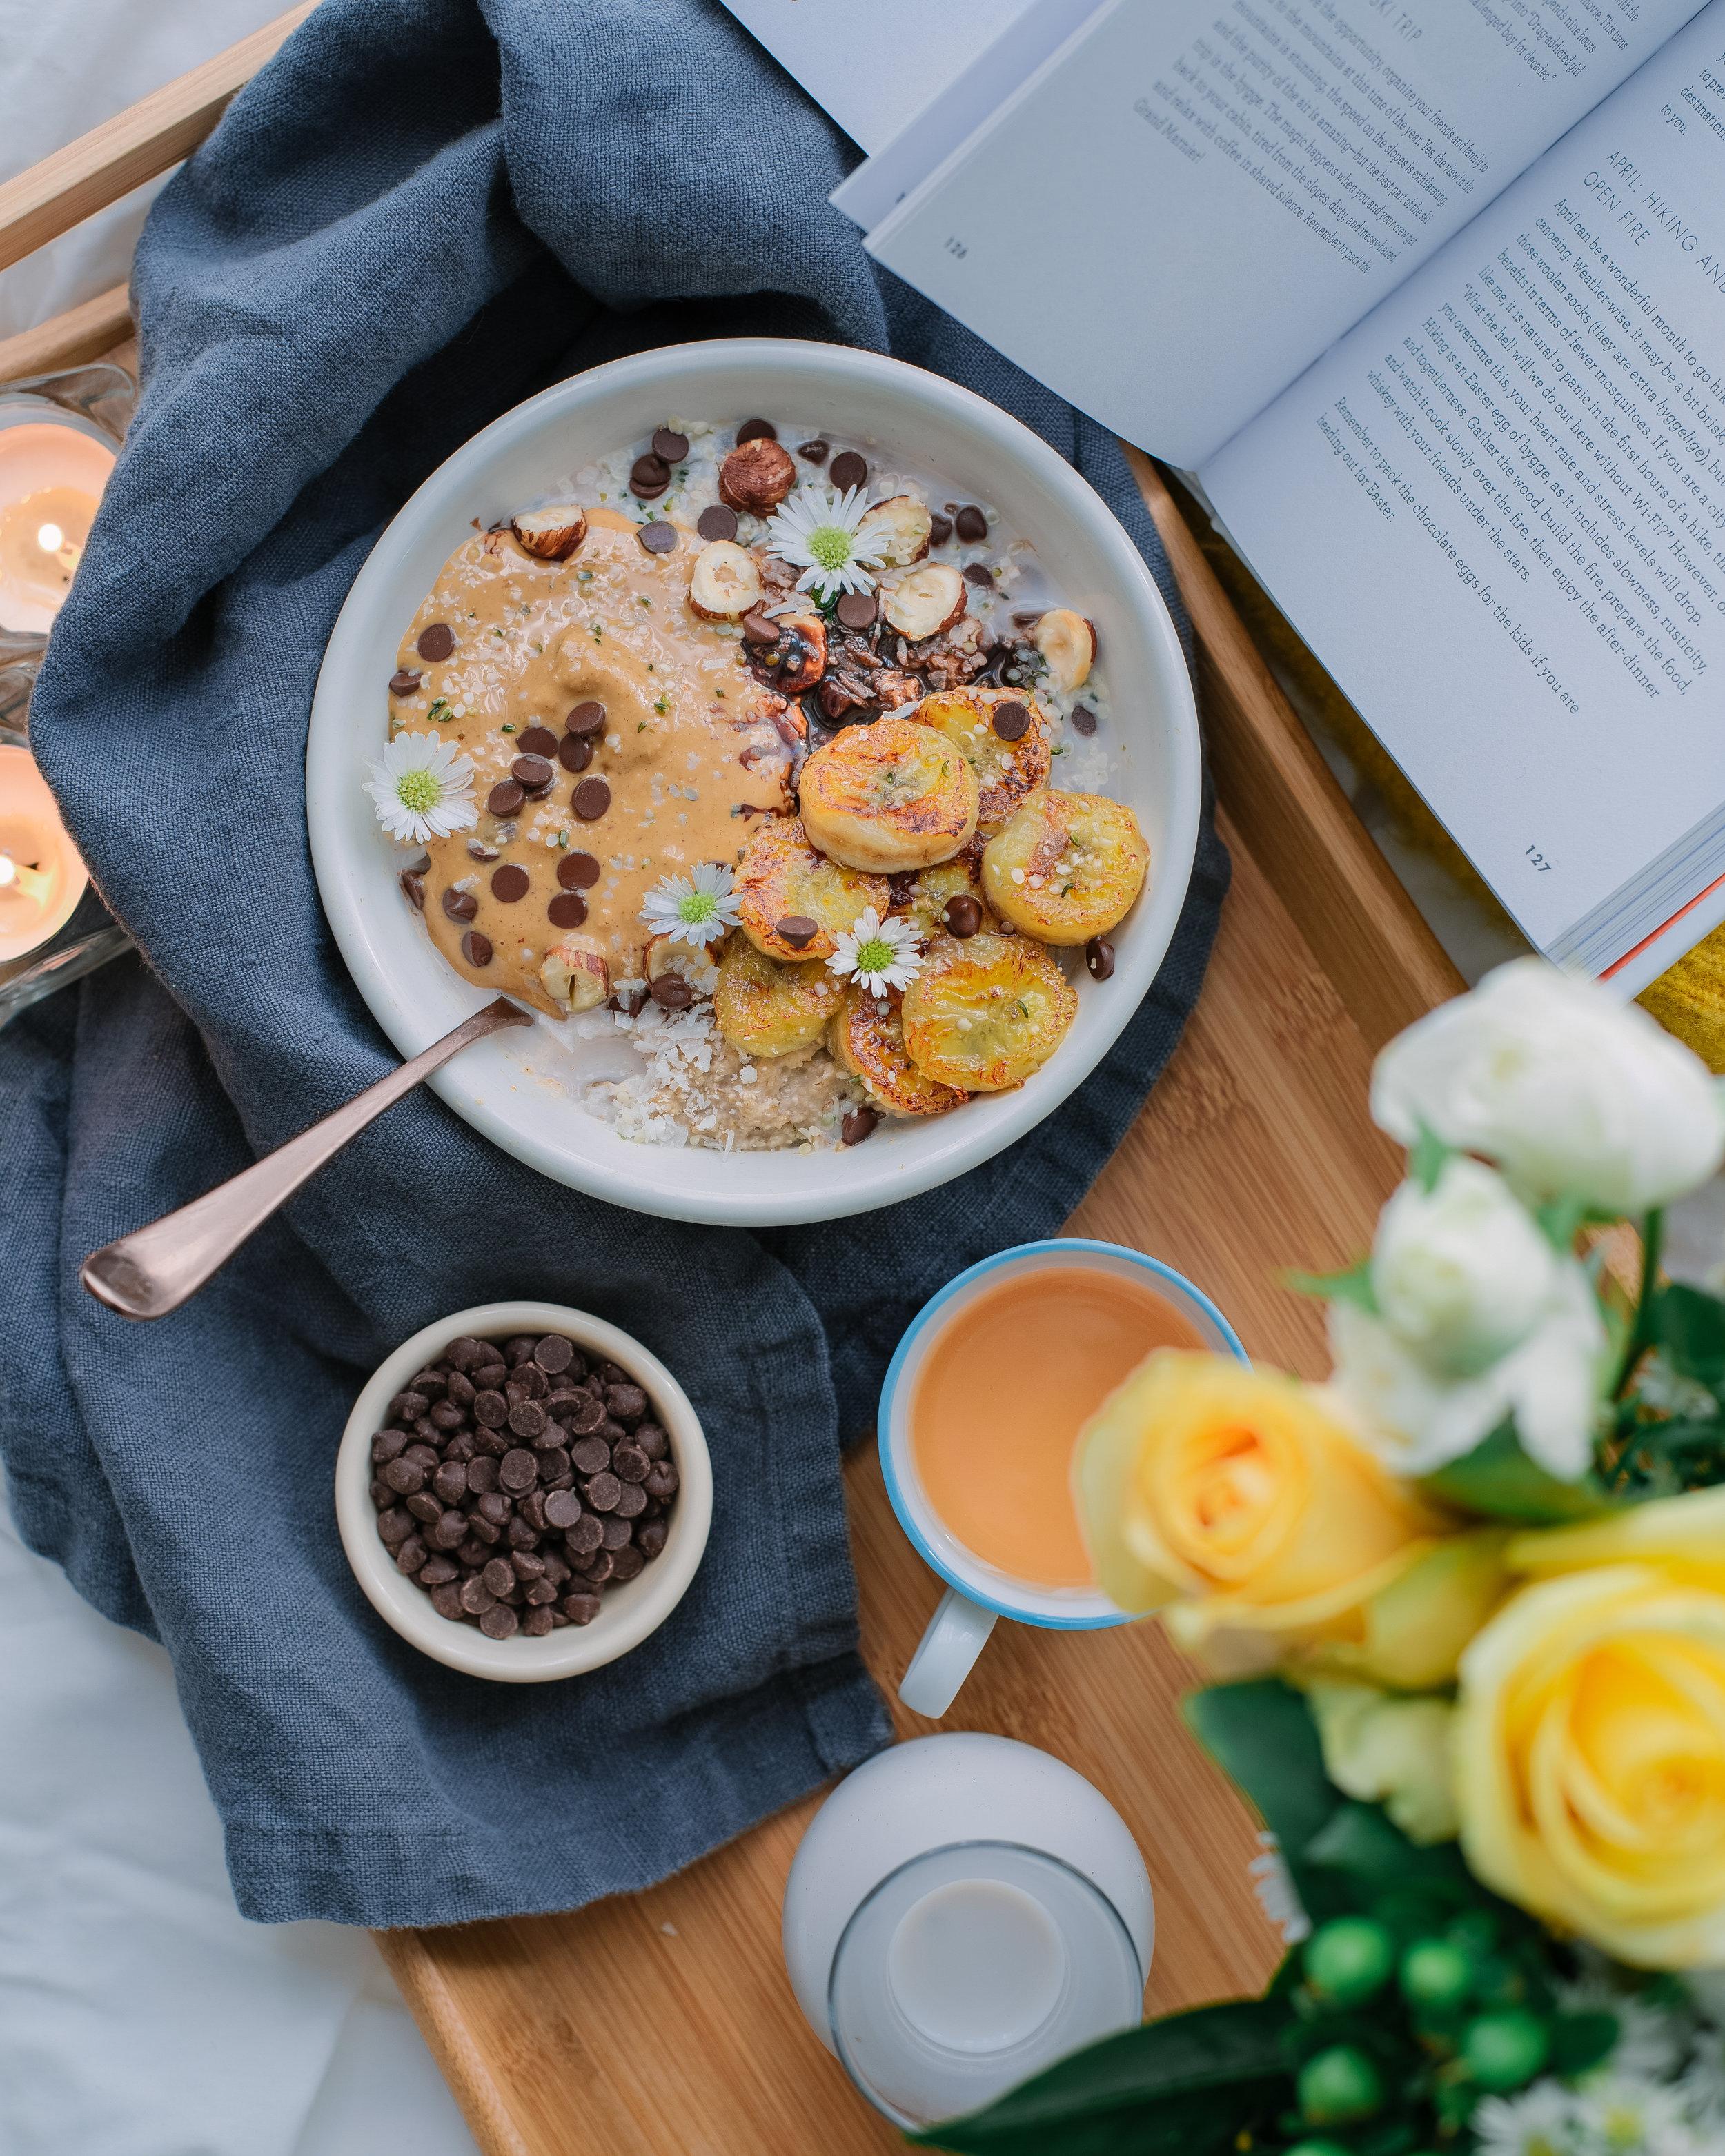 Caramelized Banana Porridge - V, GF